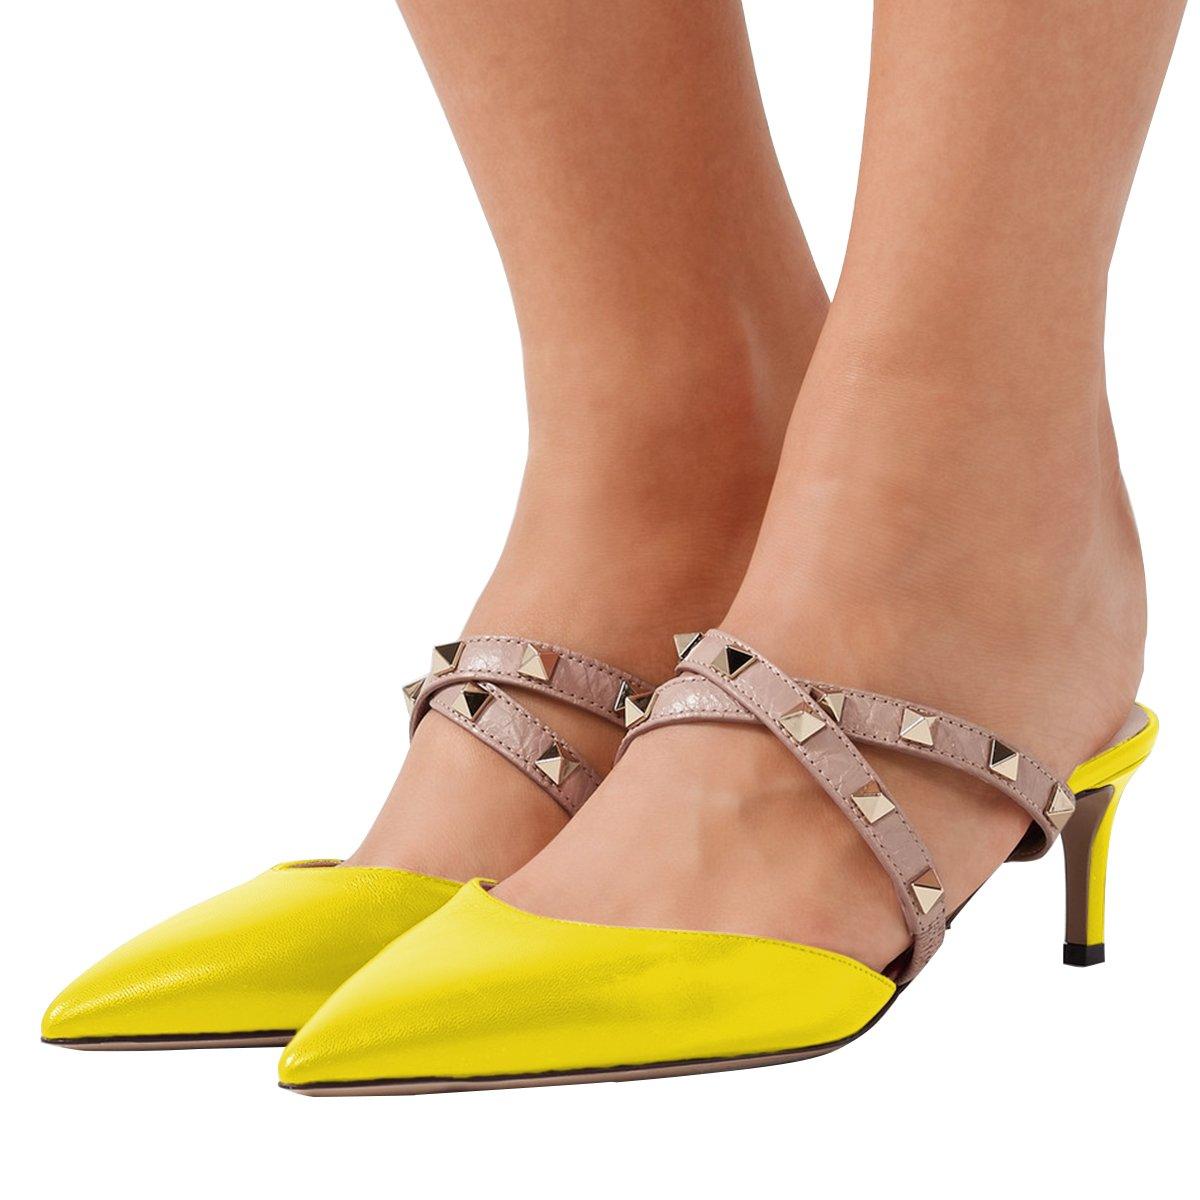 XYD Women Pointed Toe Studded Crisscross Strap Mule Sandal Pump Mid Heel Slip On Slide Shoes Size 9.5 Yellow